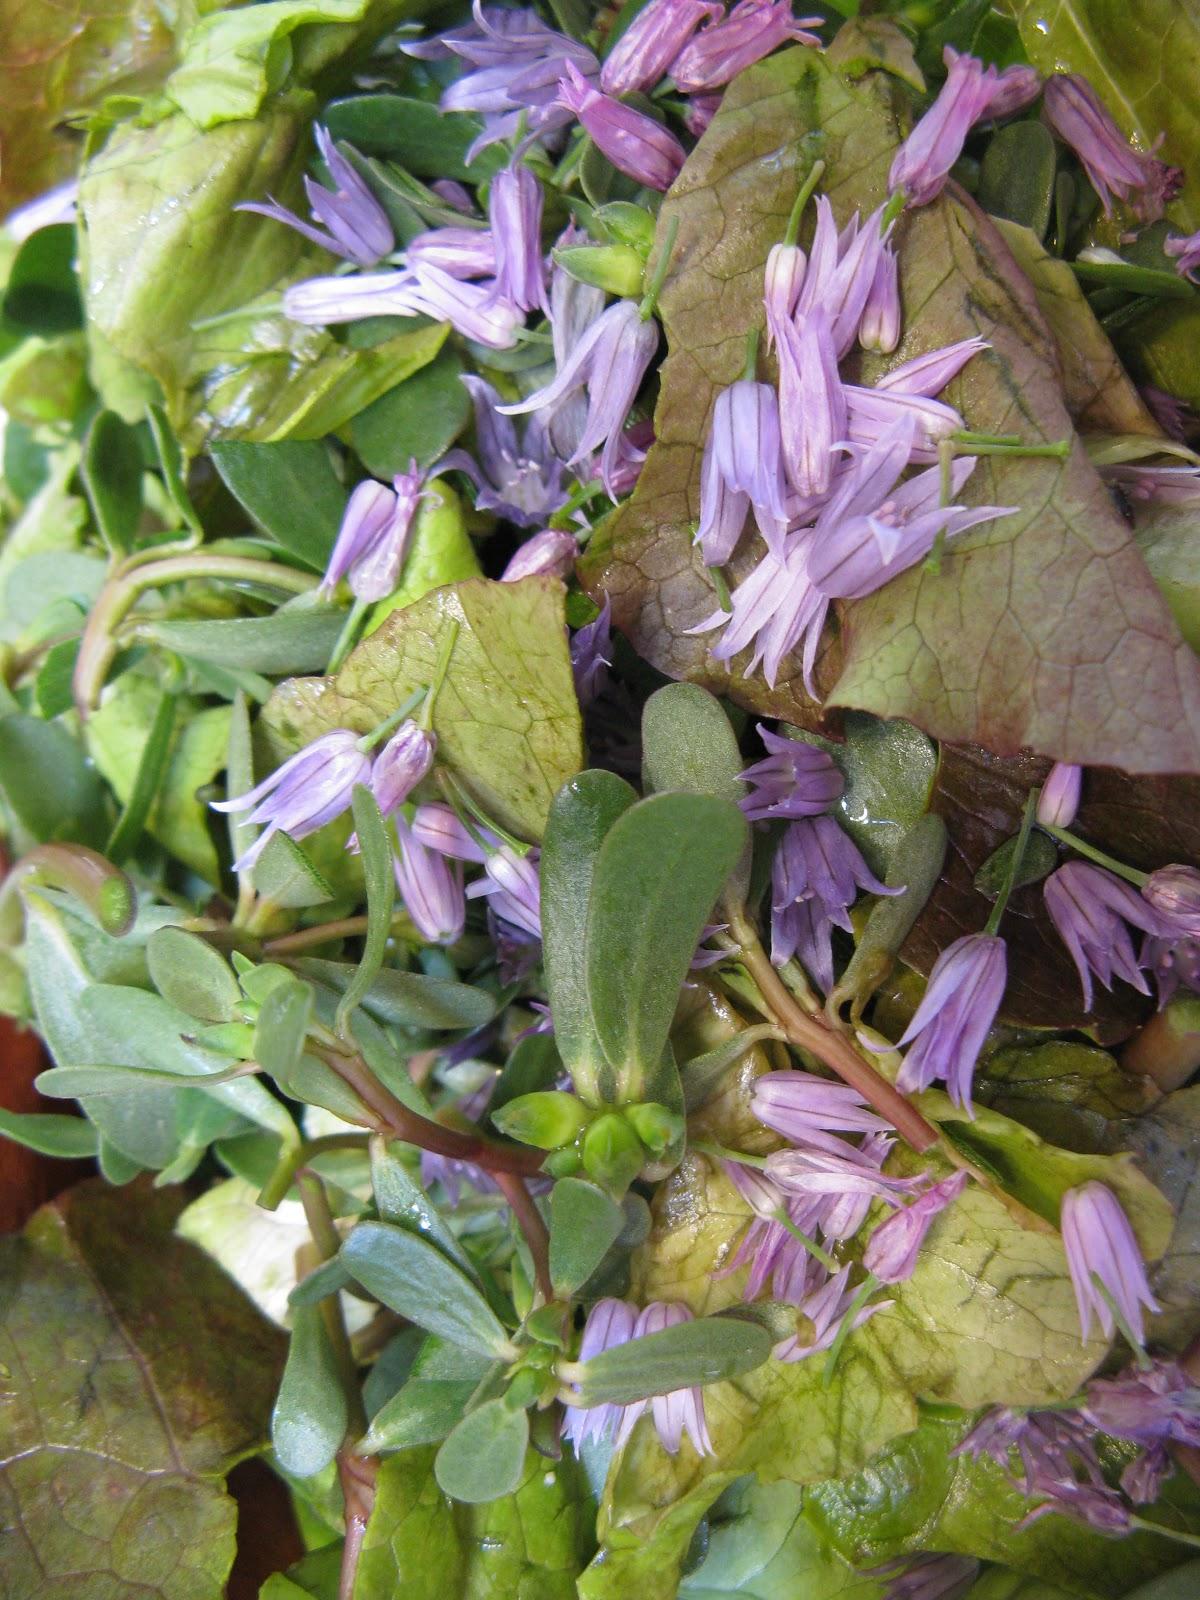 Growing Purslane How To Grow Edible Purslane In The Garden: WendyKate: Salads With Purslane